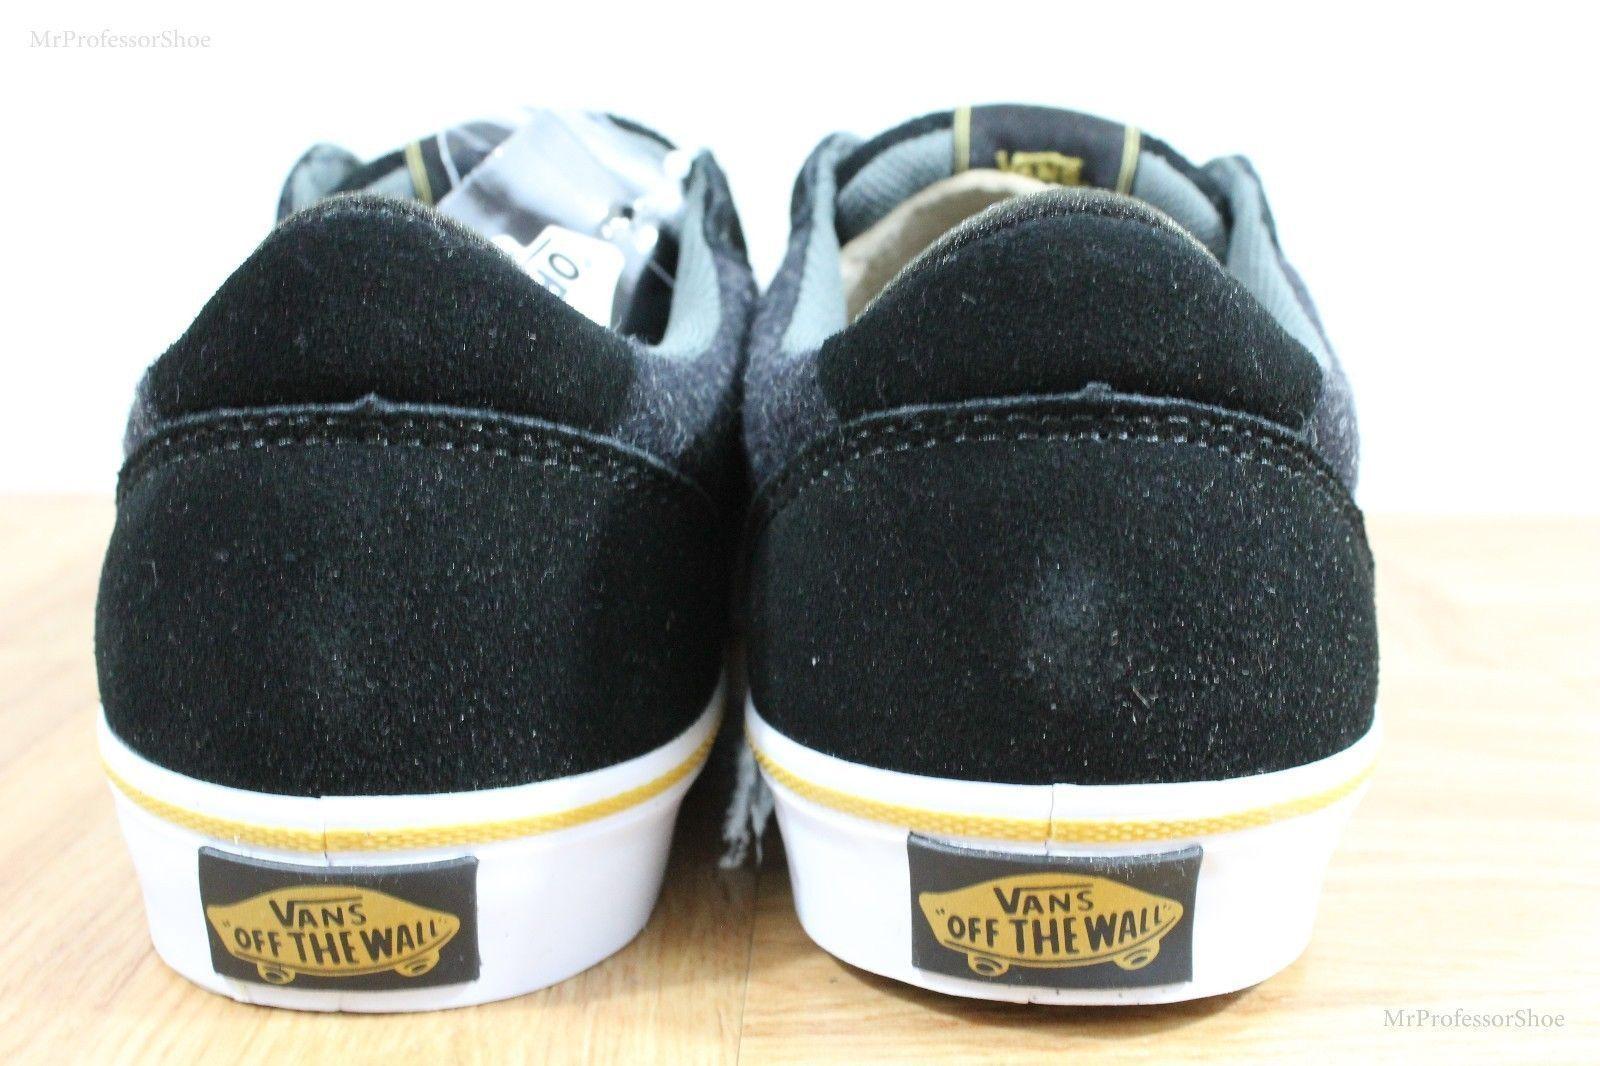 Vans Lindero (Wool) Black/Gold Skate Shoes MEN'S 7.5 WOMEN'S 9 image 5